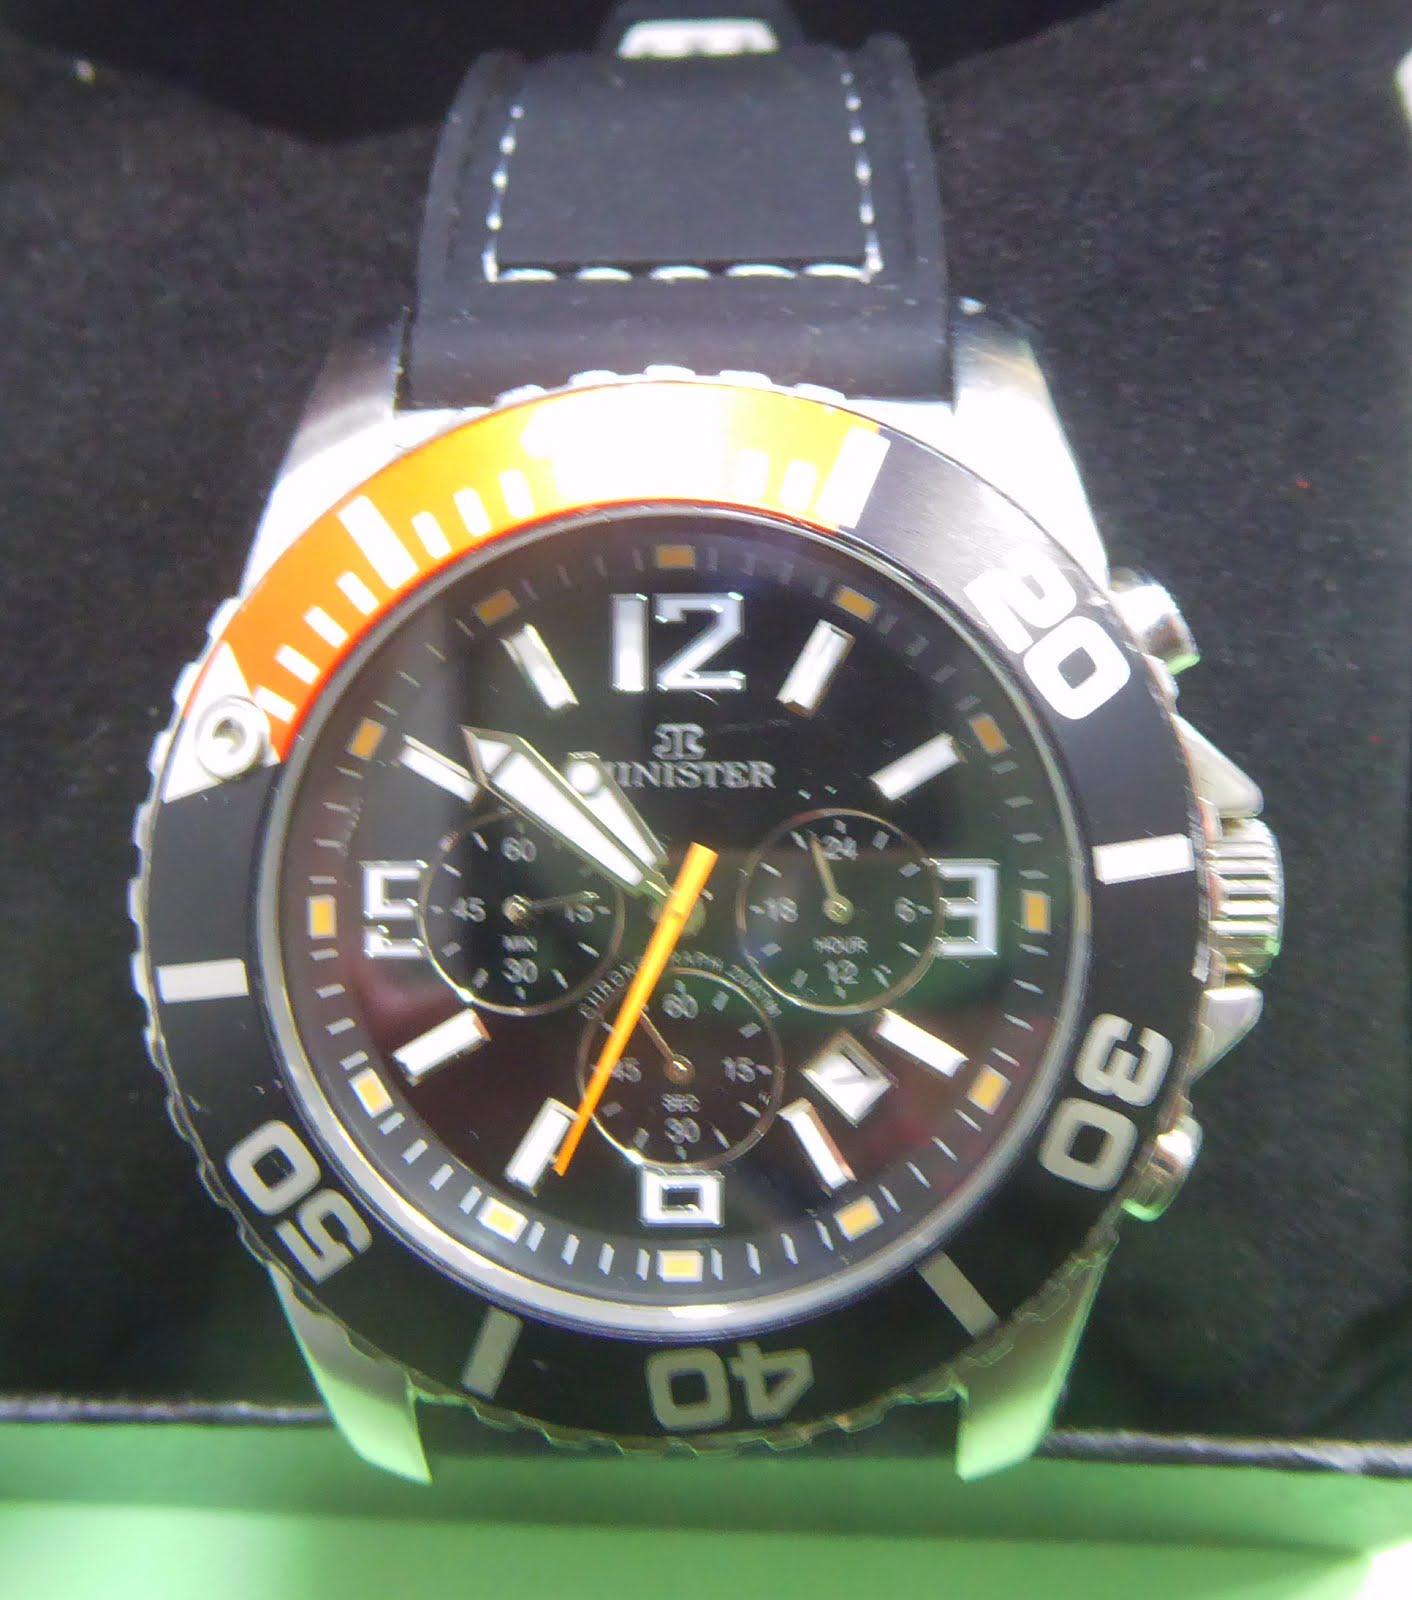 Reloj Minister